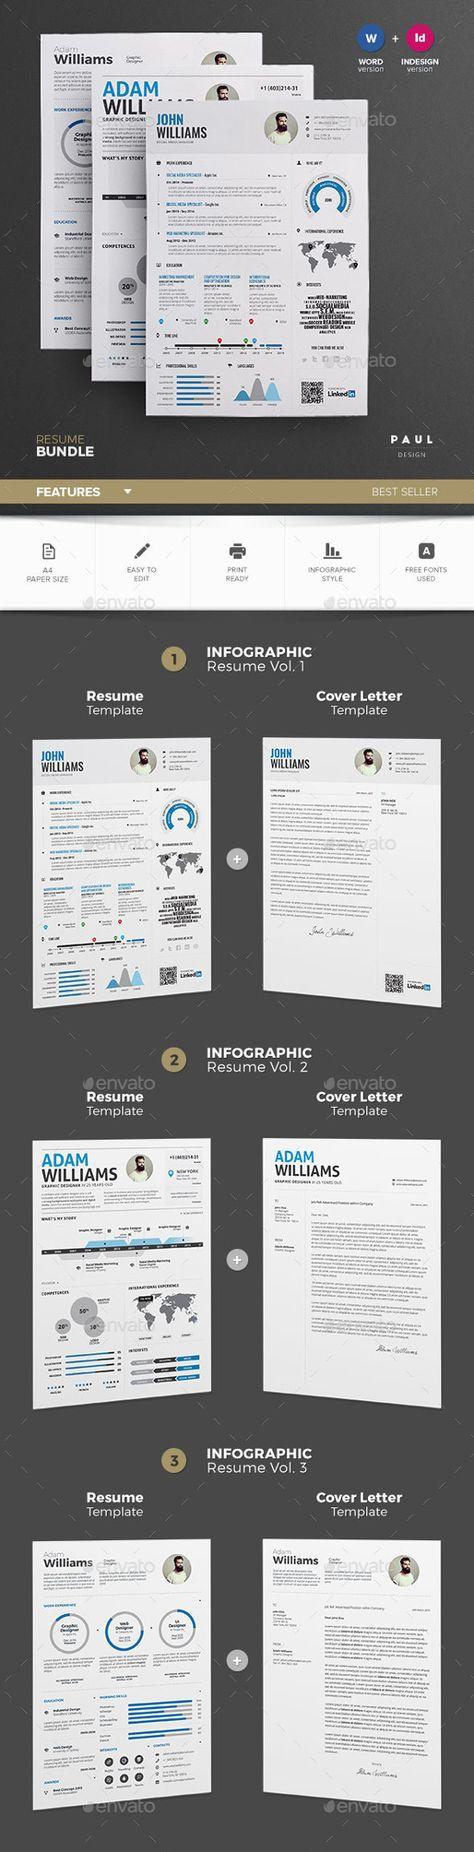 Infographic resume builder online free